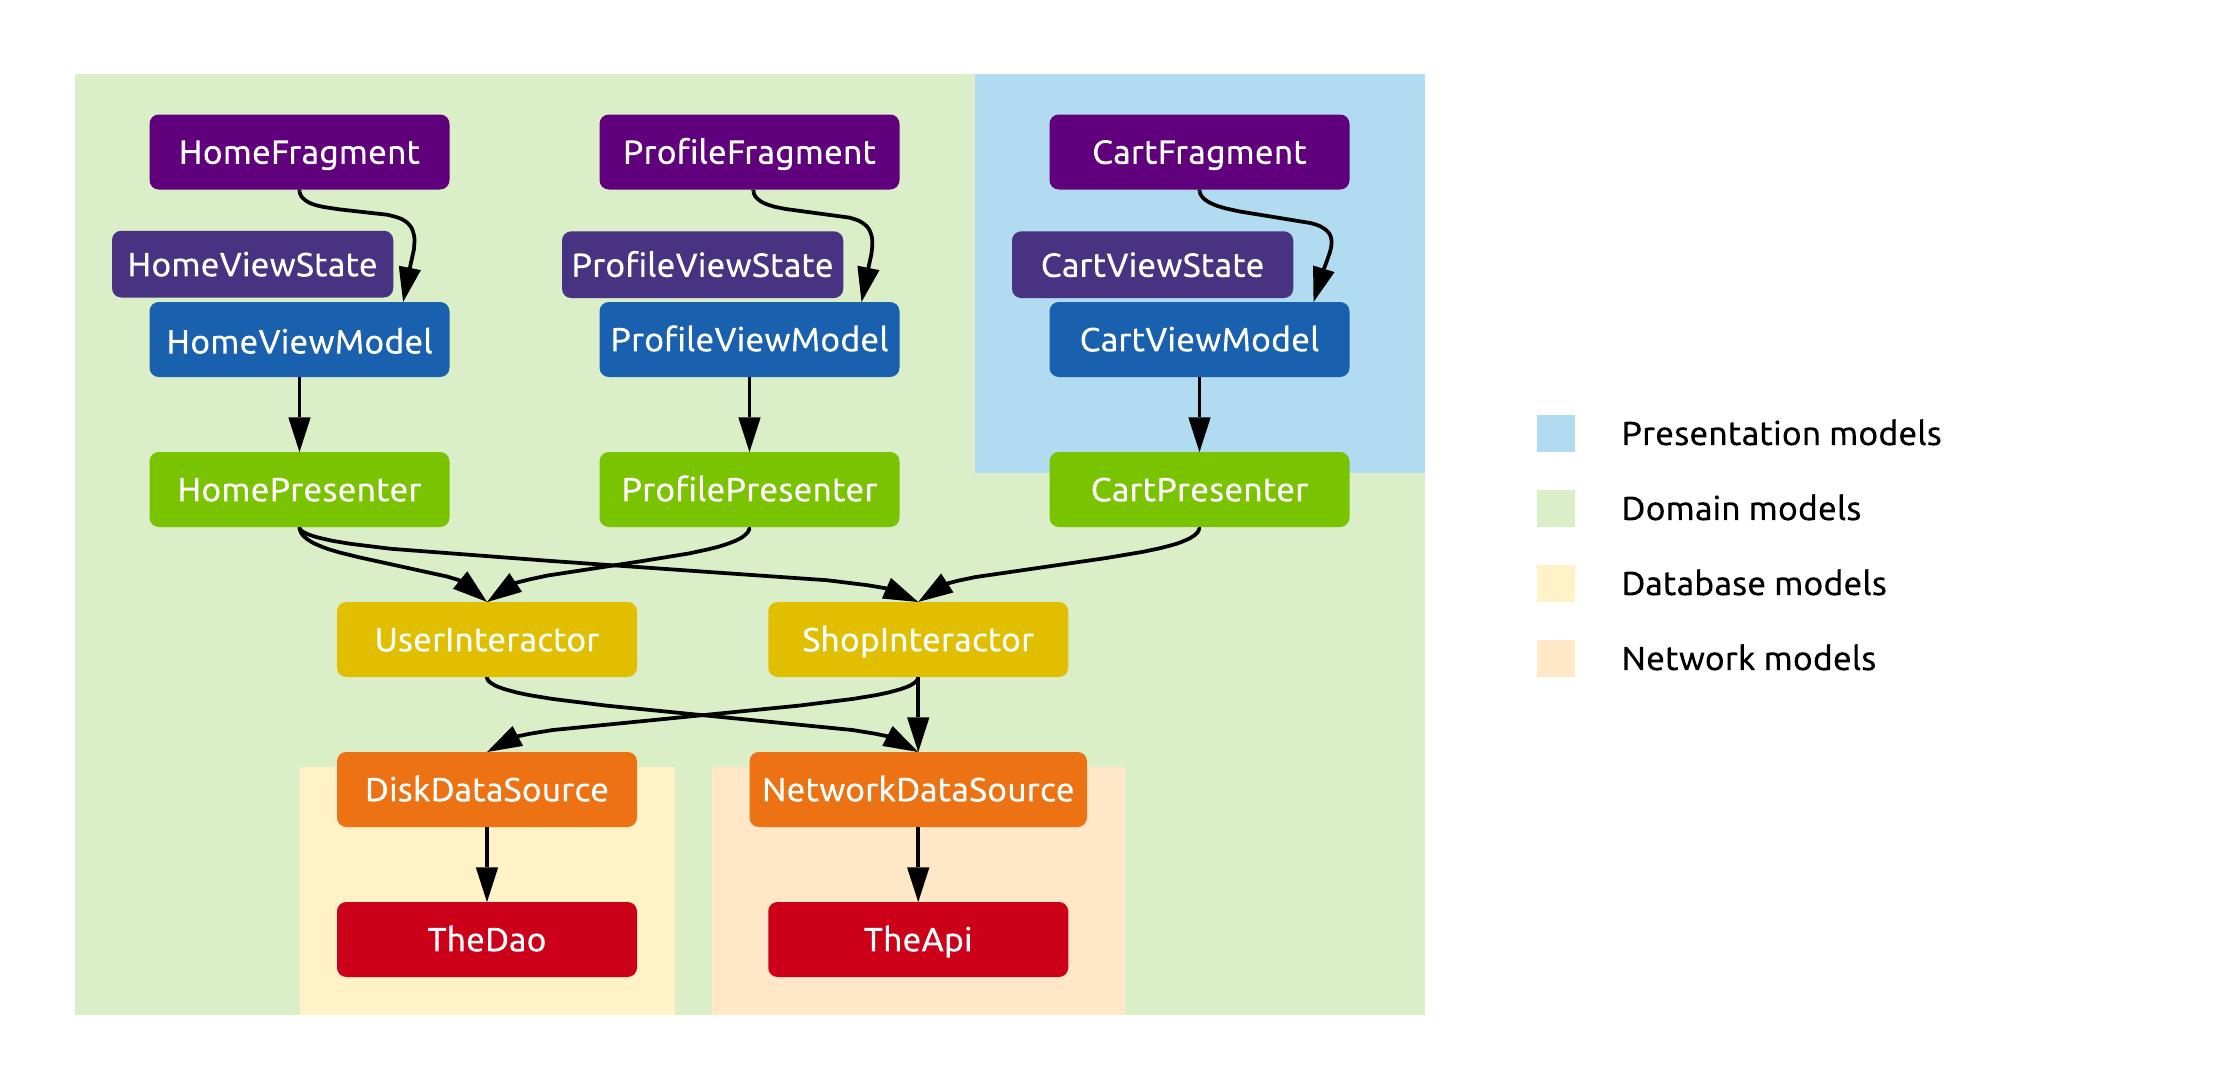 Using domain models as presentation models